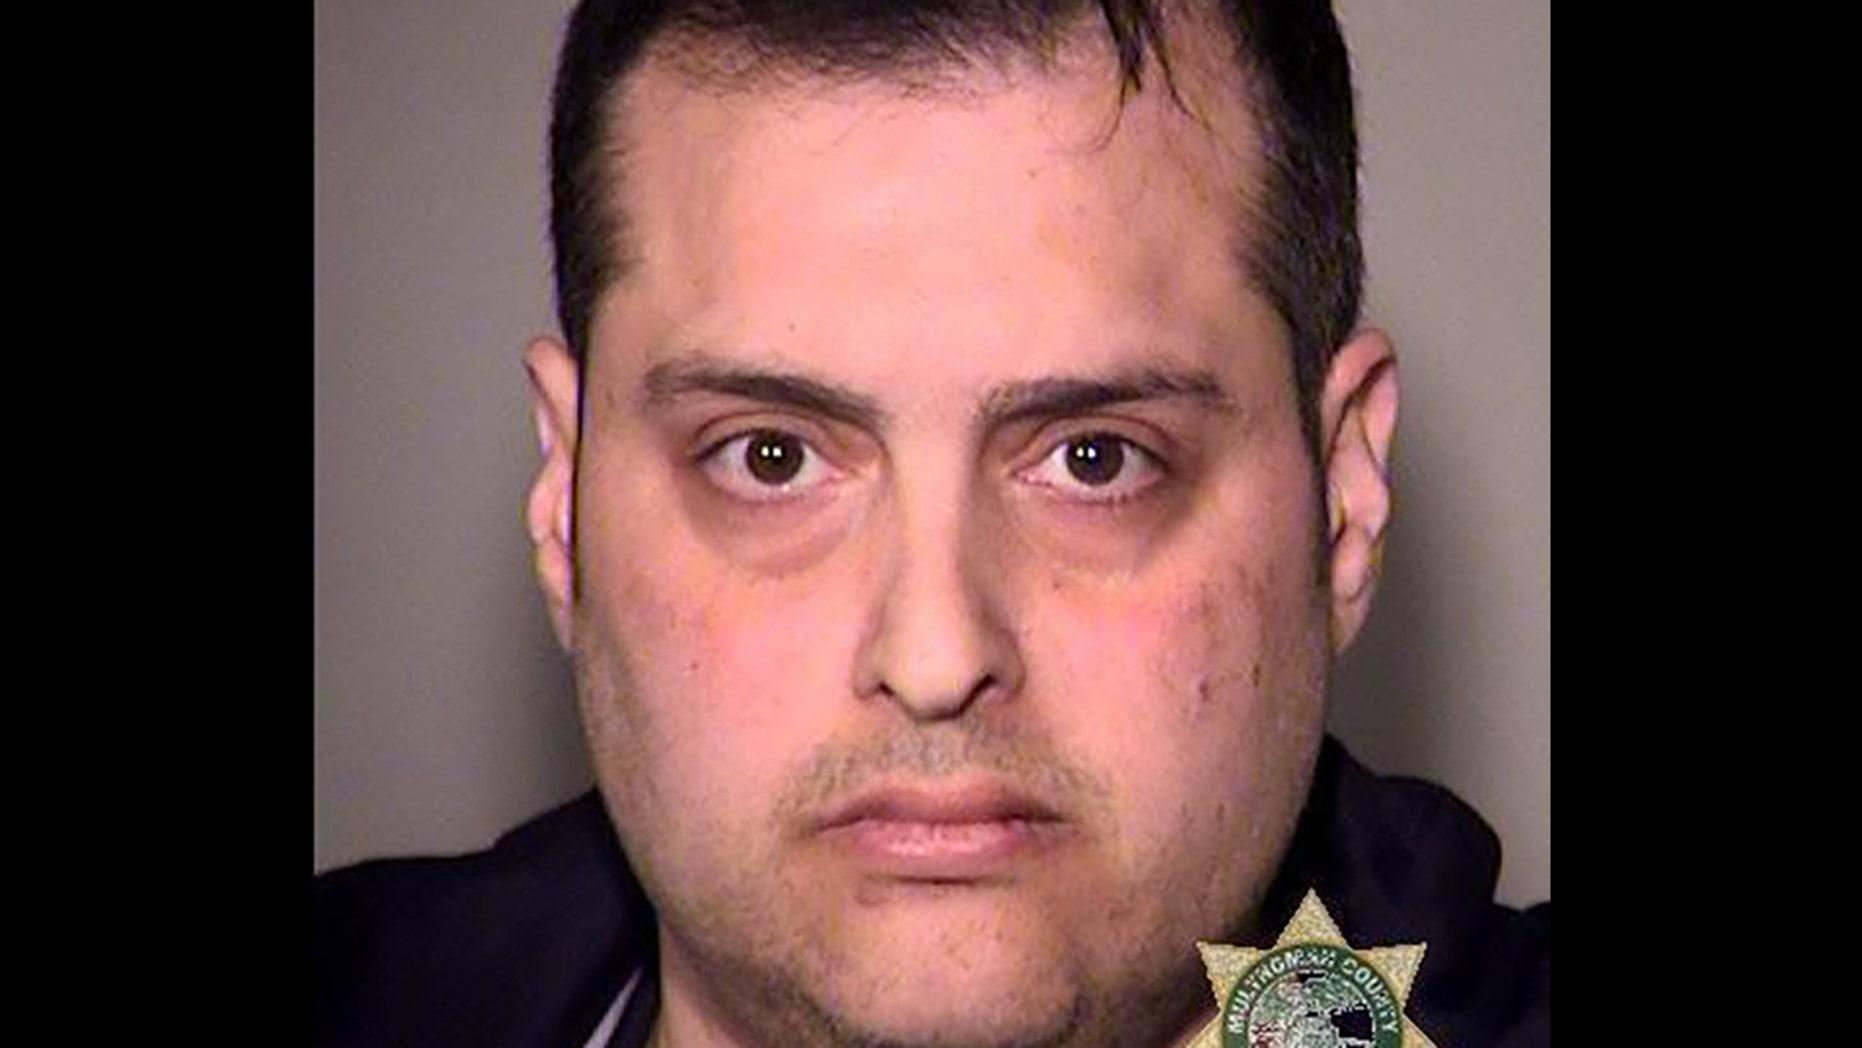 Raji Afife Azar, 40, of Portland, is accused of leading a Lego theft ring.